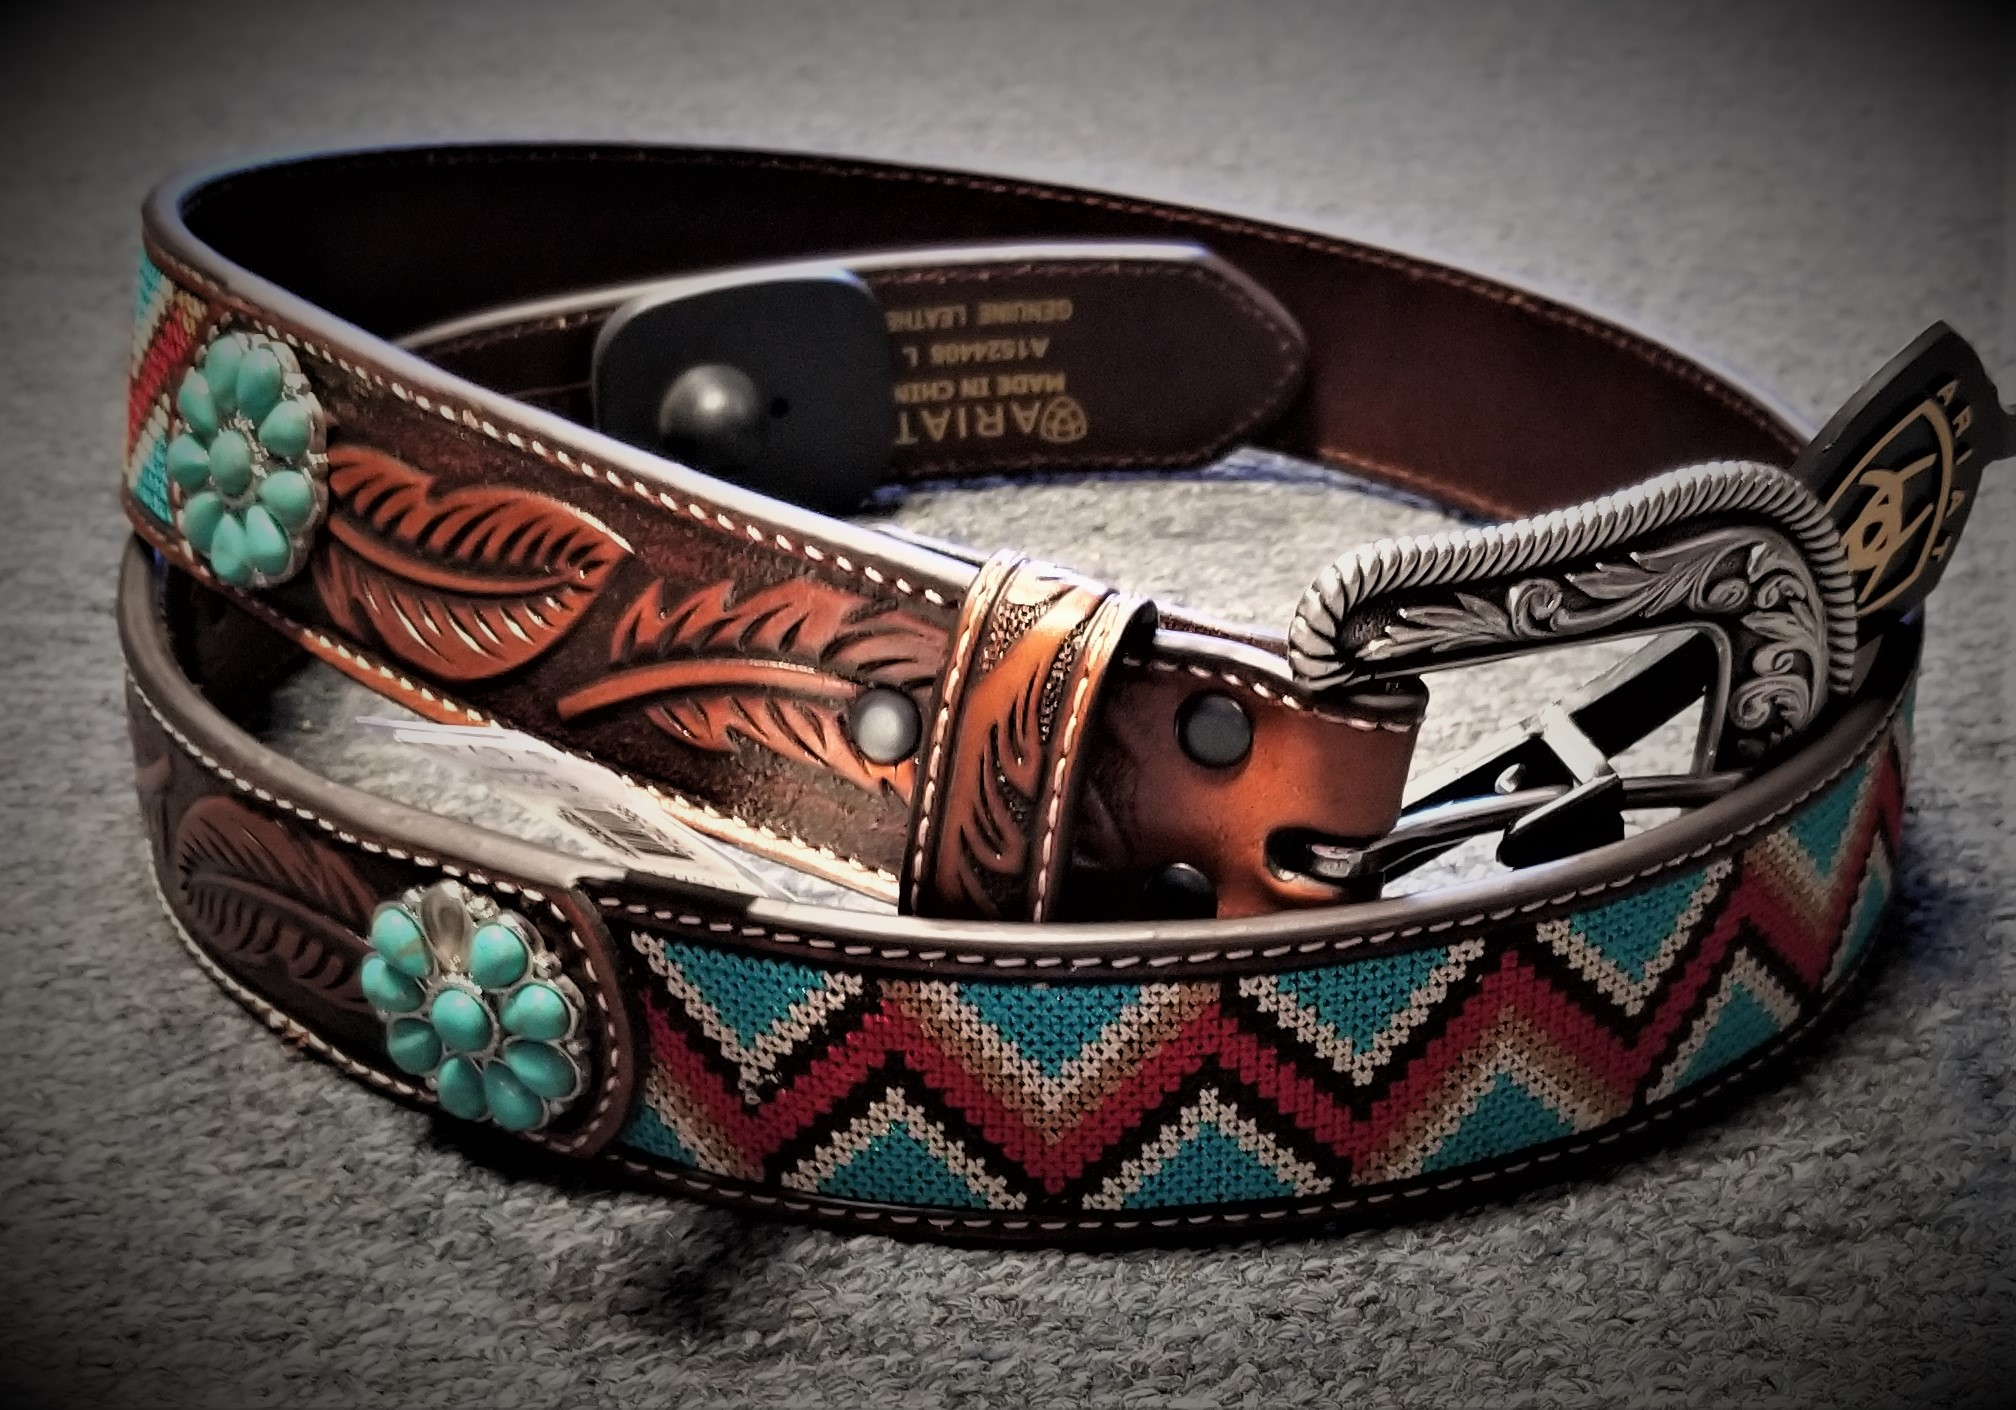 ariat-genuine-leather-womens-belt-tooled-leaf-zig-zag-colors-size-large-665145-65.00.jpg